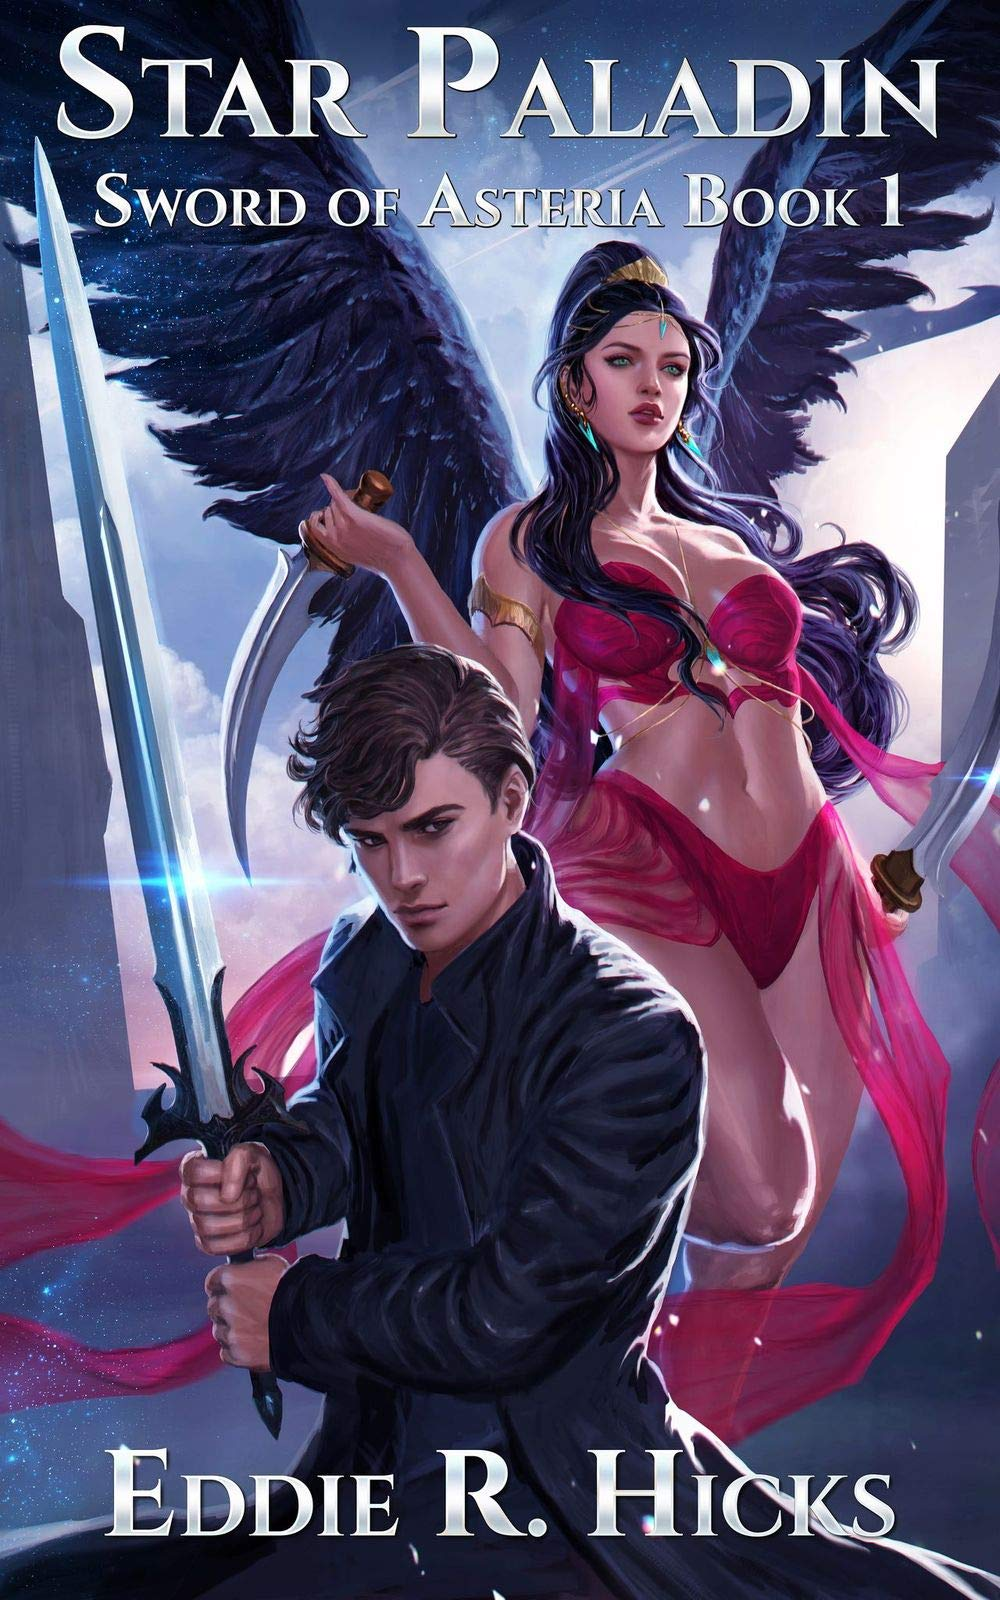 Star Paladin: A LitRPG Space Fantasy (Sword of Asteria Book 1)